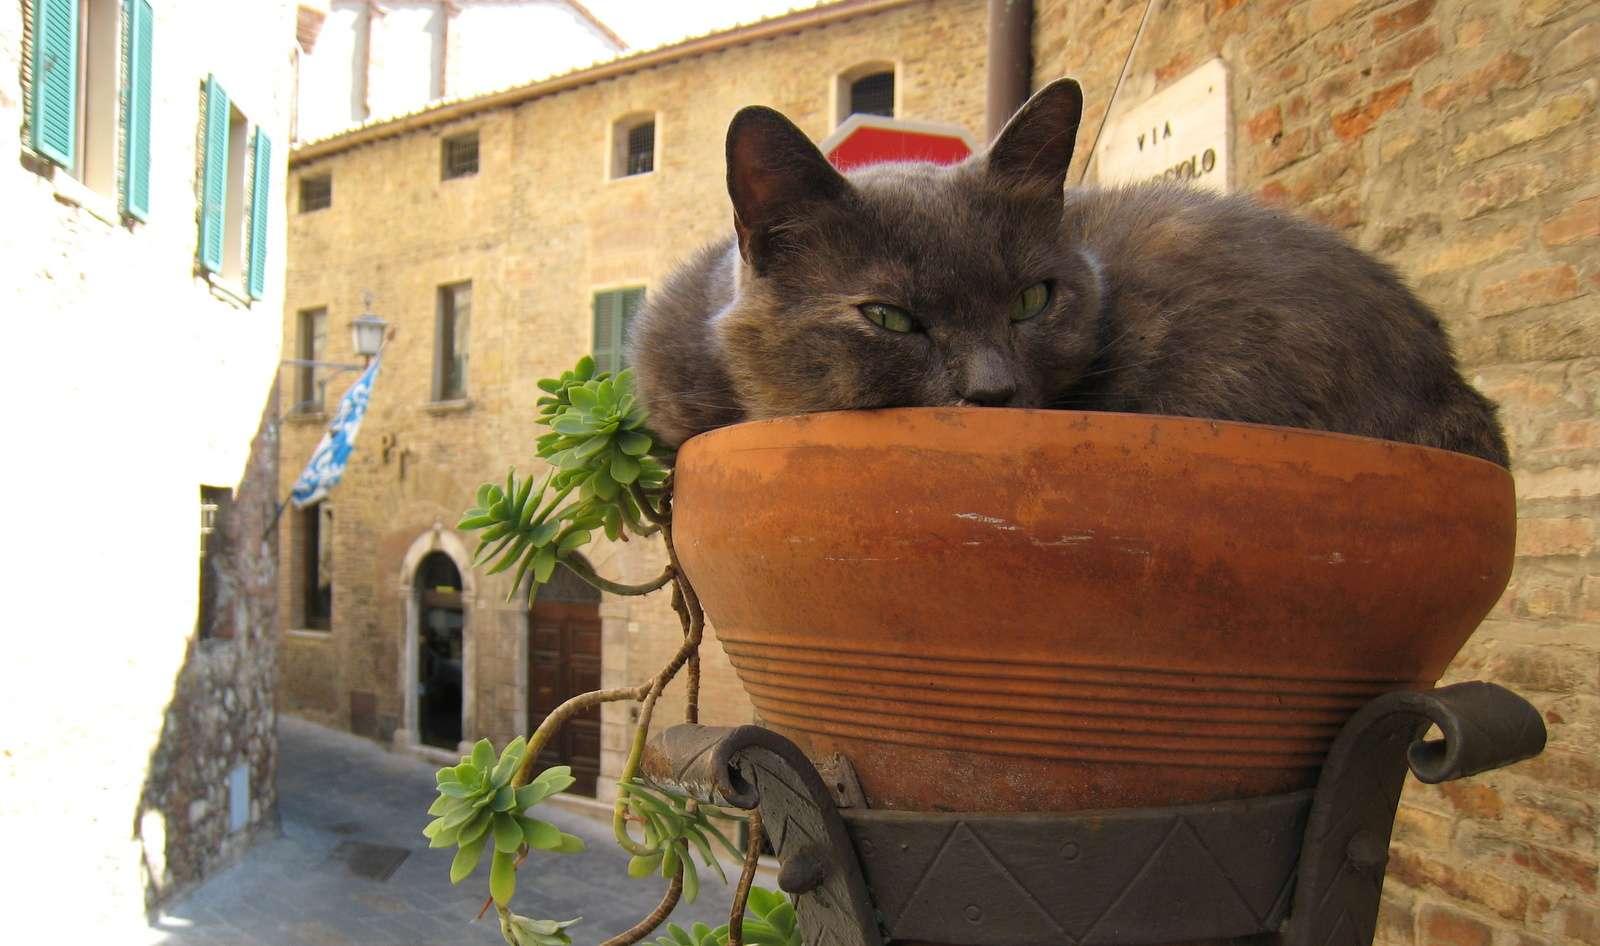 A cat in Montepulciano